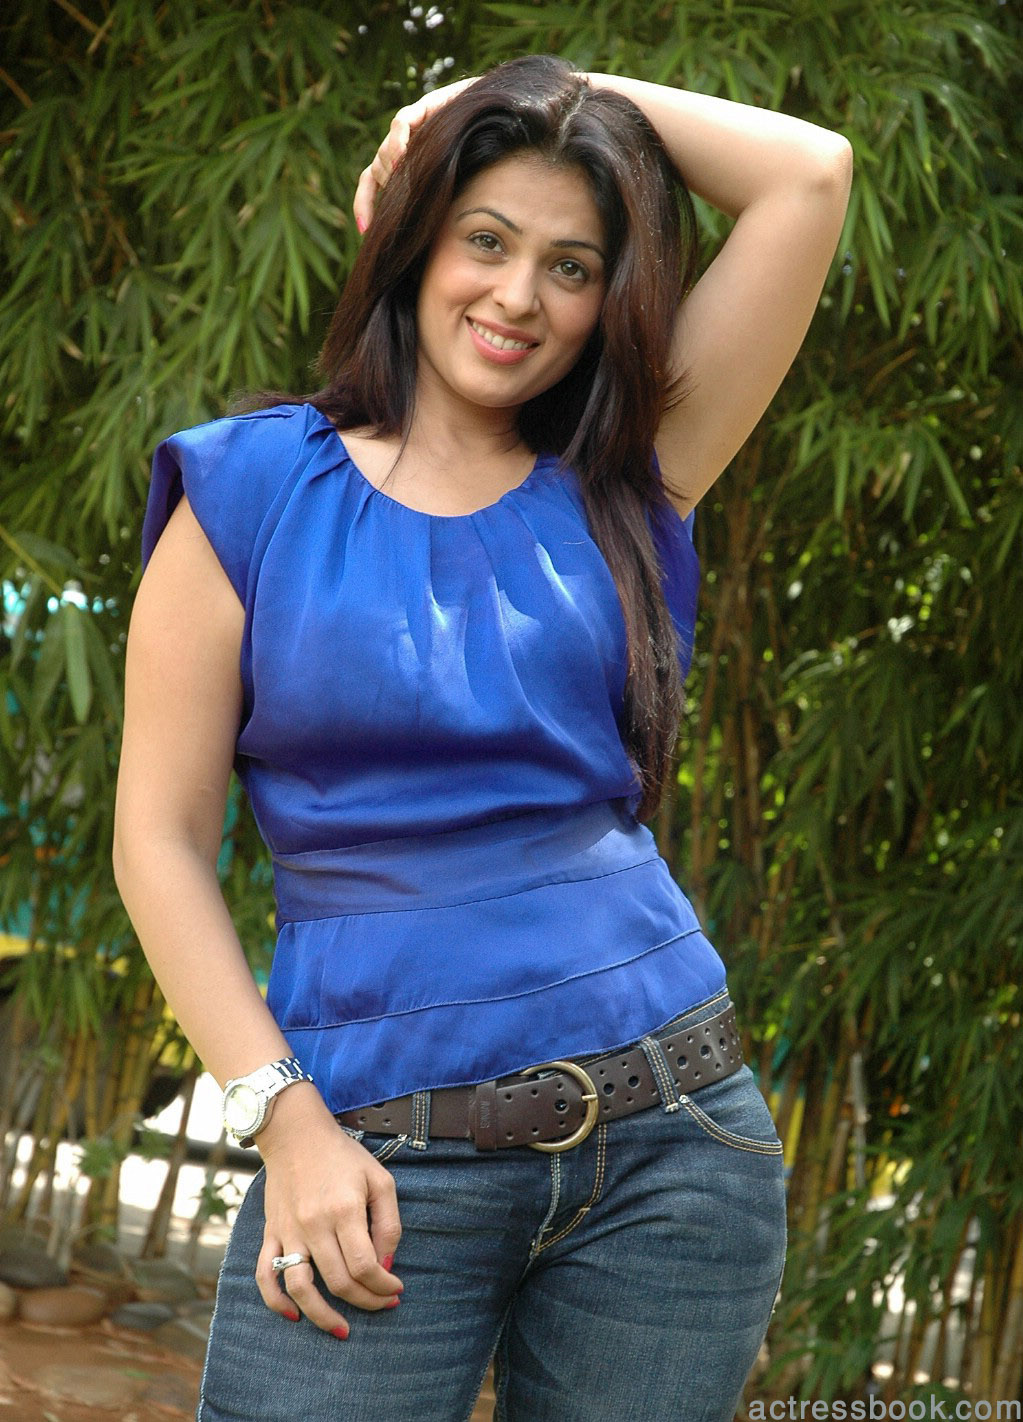 Sexy Girl Bikini New: Bollywood hot actress Anjana Sukhani pics | Anjana Sukhani latest photos ...